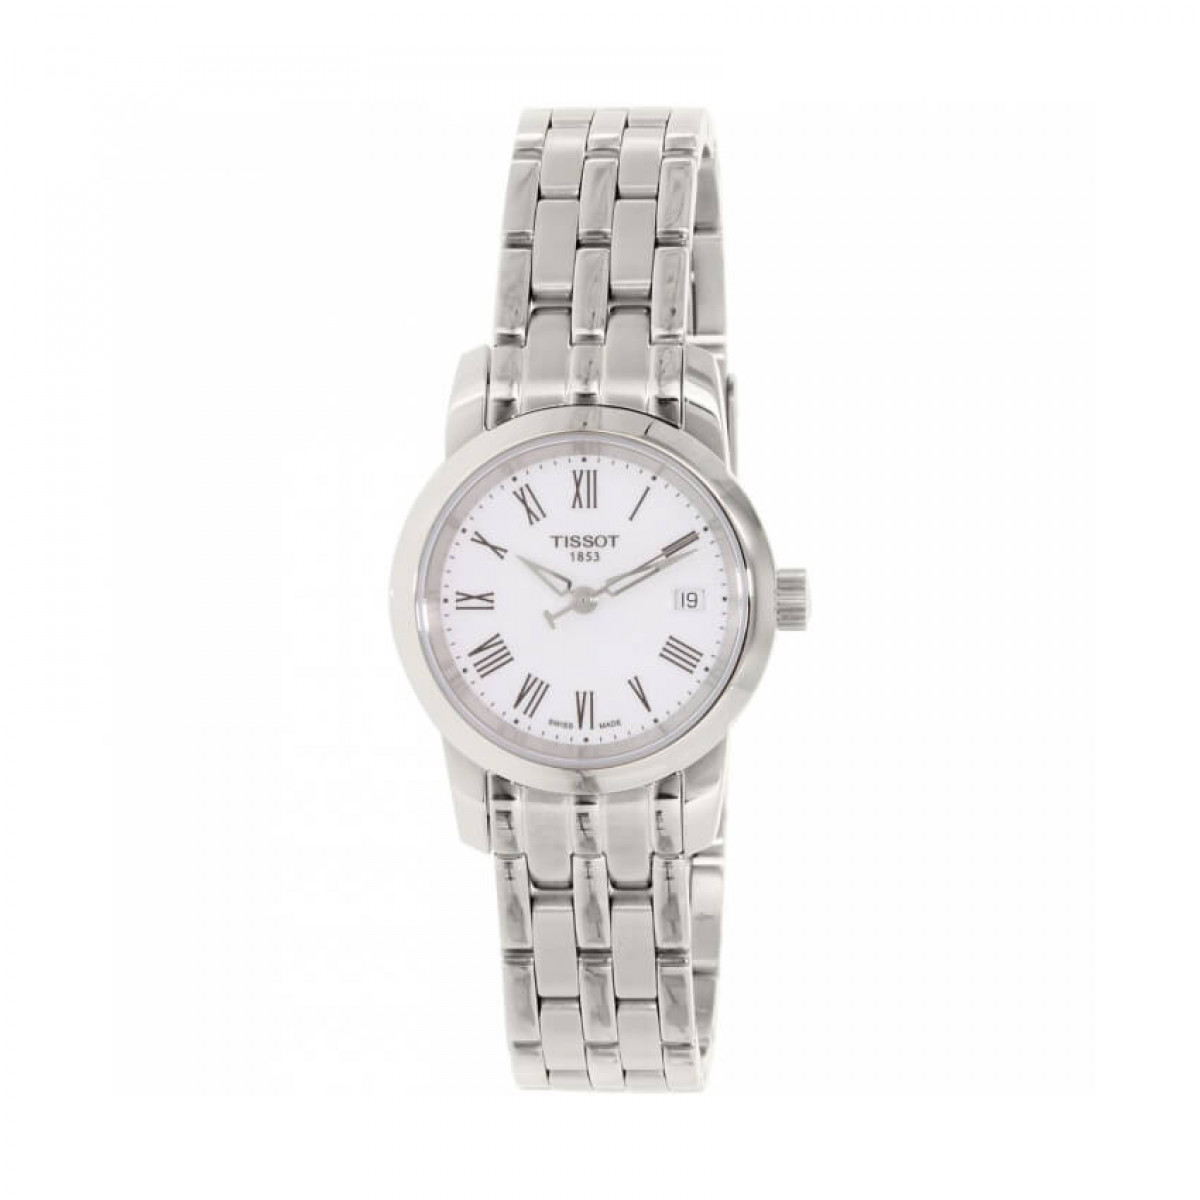 Часовник Tissot T033.210.11.013.00